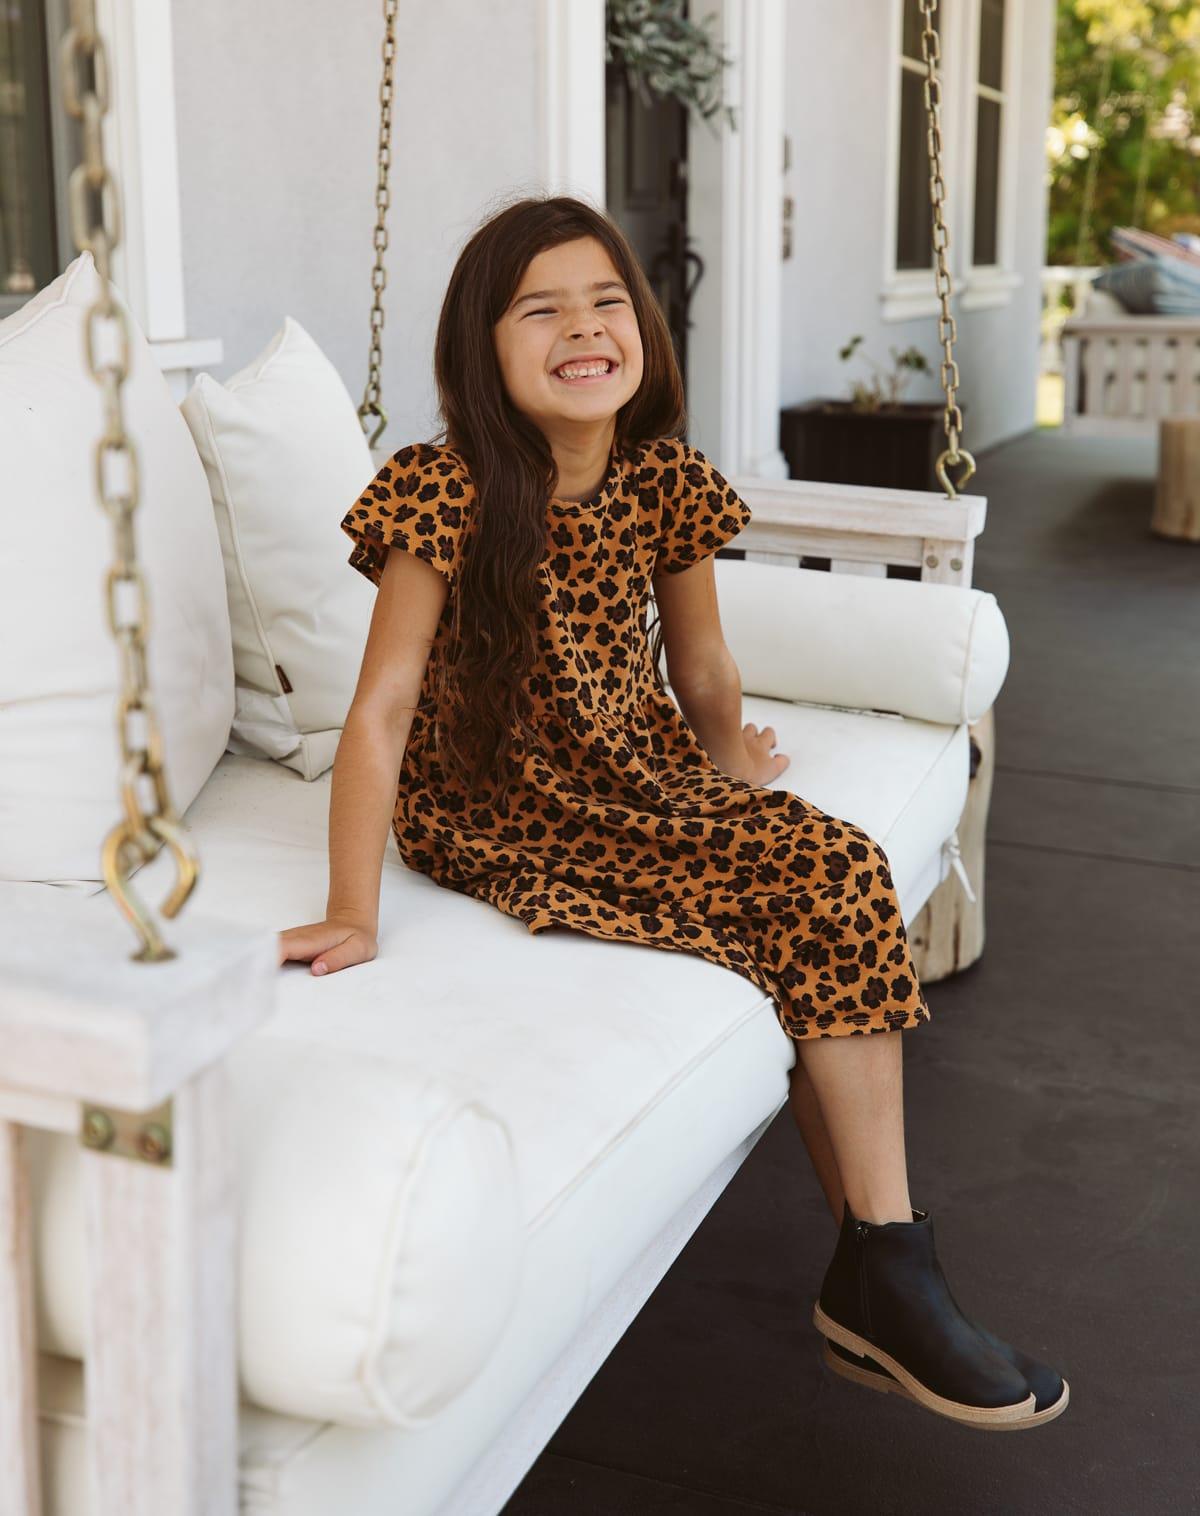 leopard kids play dress nordstrom anniversary sale